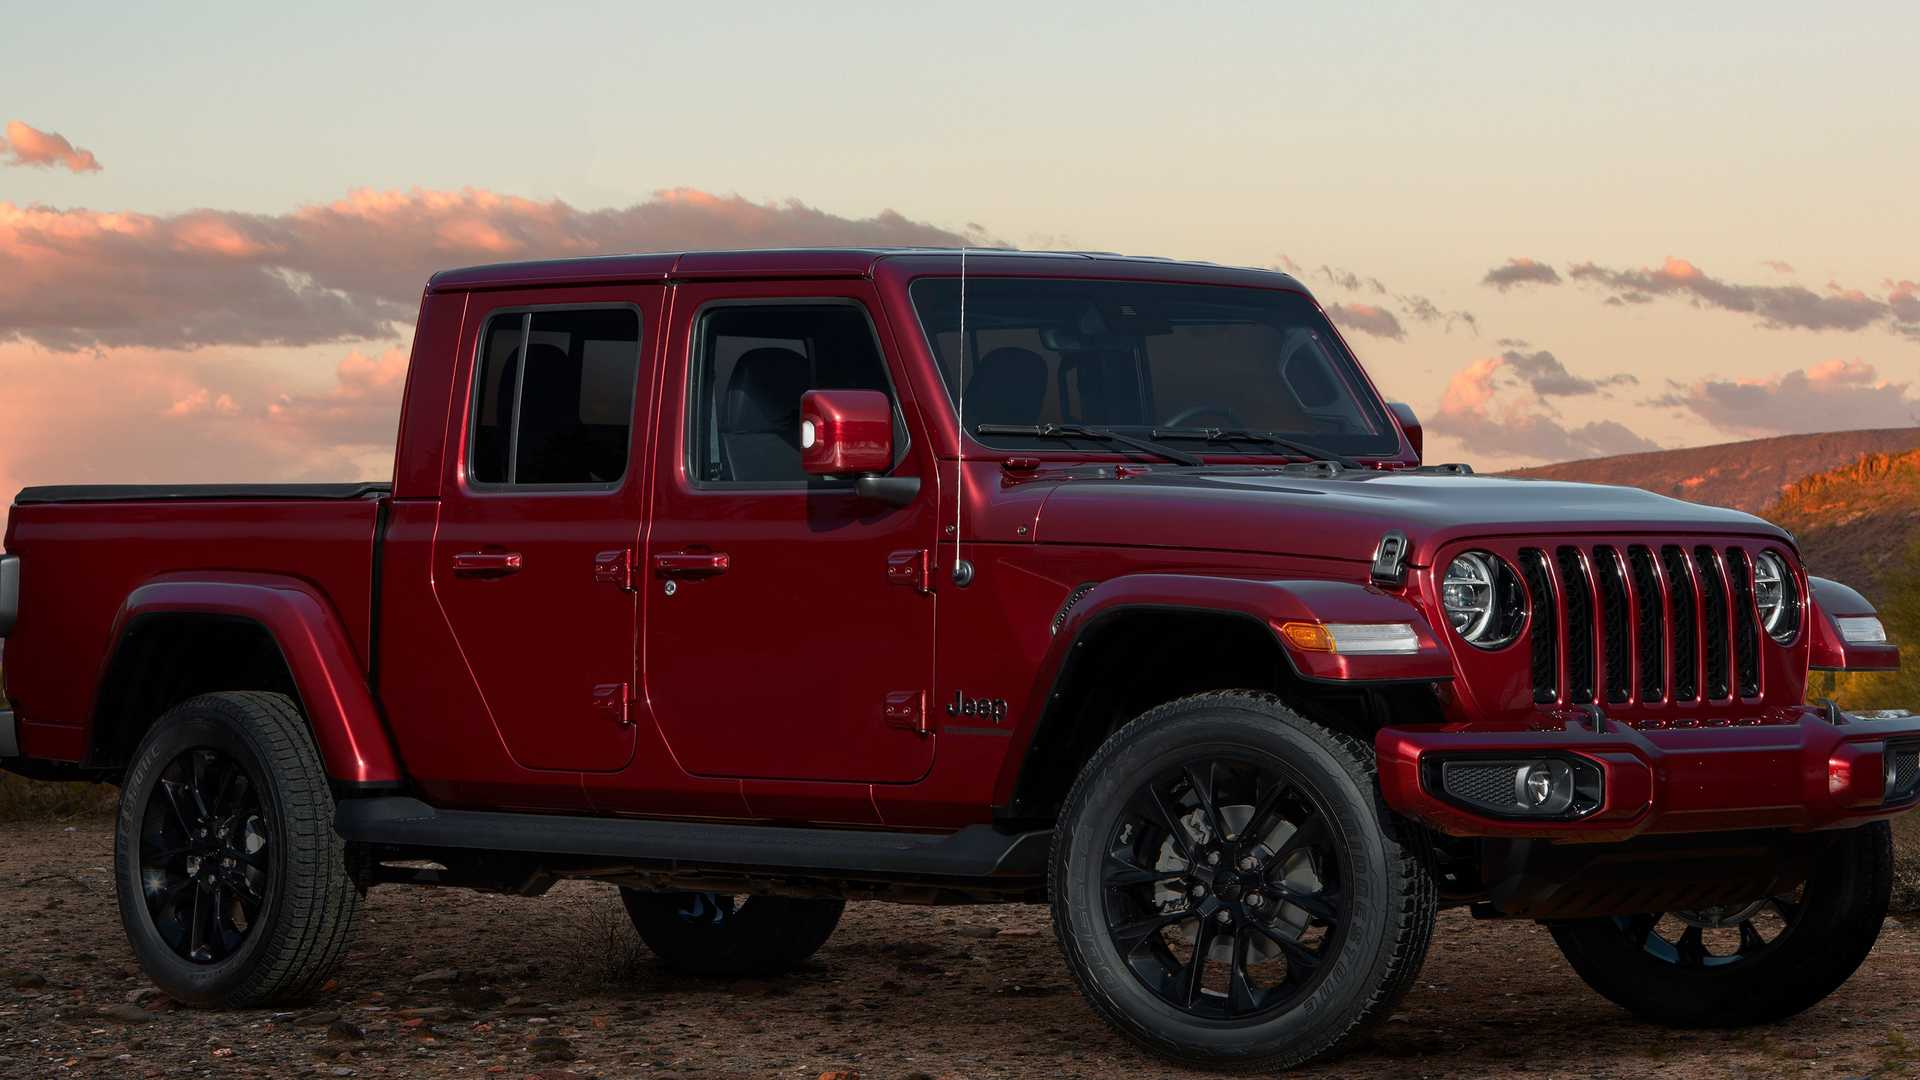 2020-jeep-gladiator-high-altitude